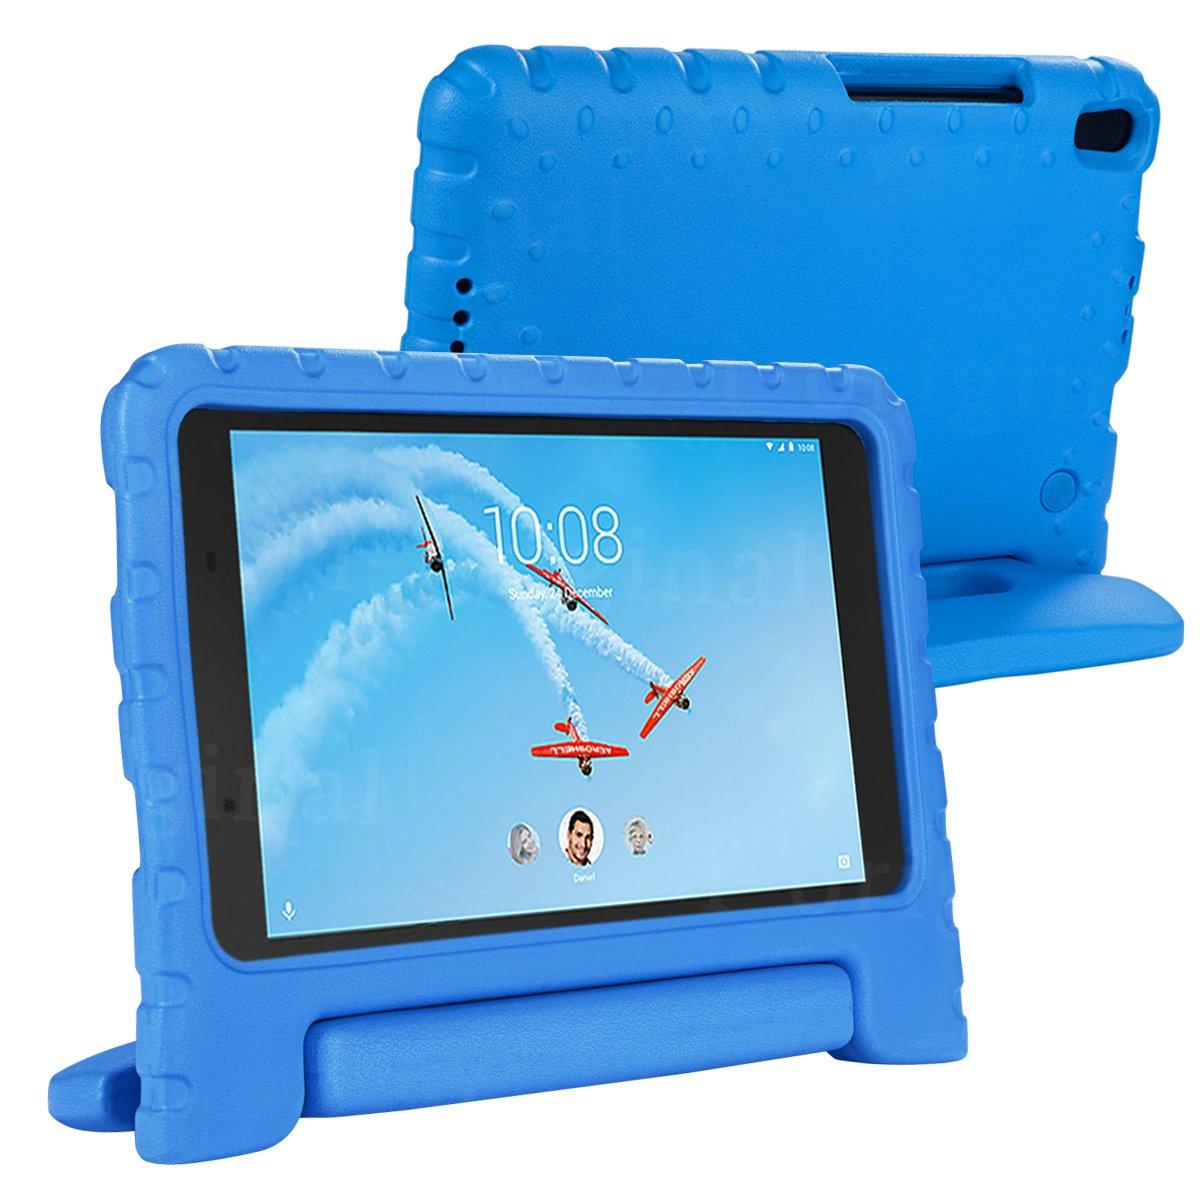 i-Original Compatible Shock Proof Lenovo Tab 4 8 Plus EVA Case for Kids Bumper Cover Handle Stand EVA Convertible Handle Light Weight EVA Protective Blue Stand Bumper Cover Tab4-LN8plus-bl